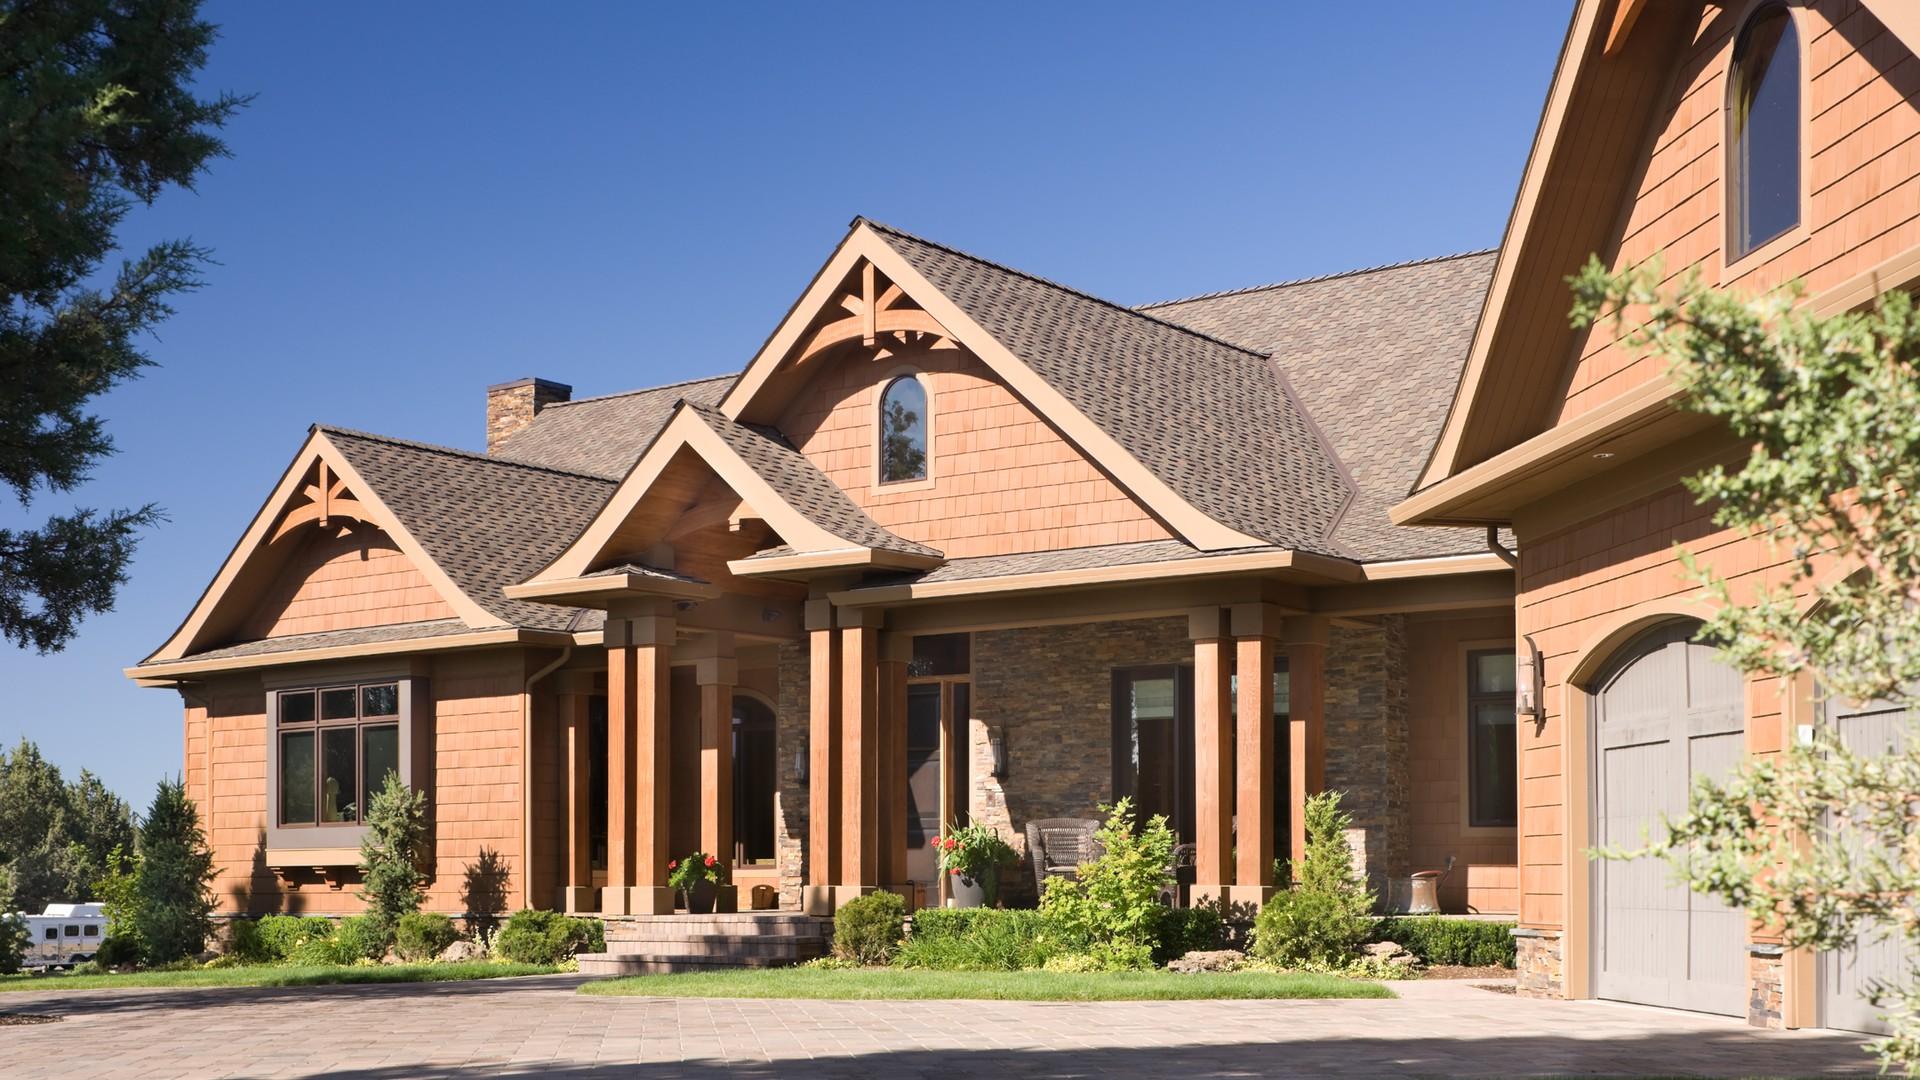 Craftsman House Plan 2467 The Hendrick 5266 Sqft 5 Beds